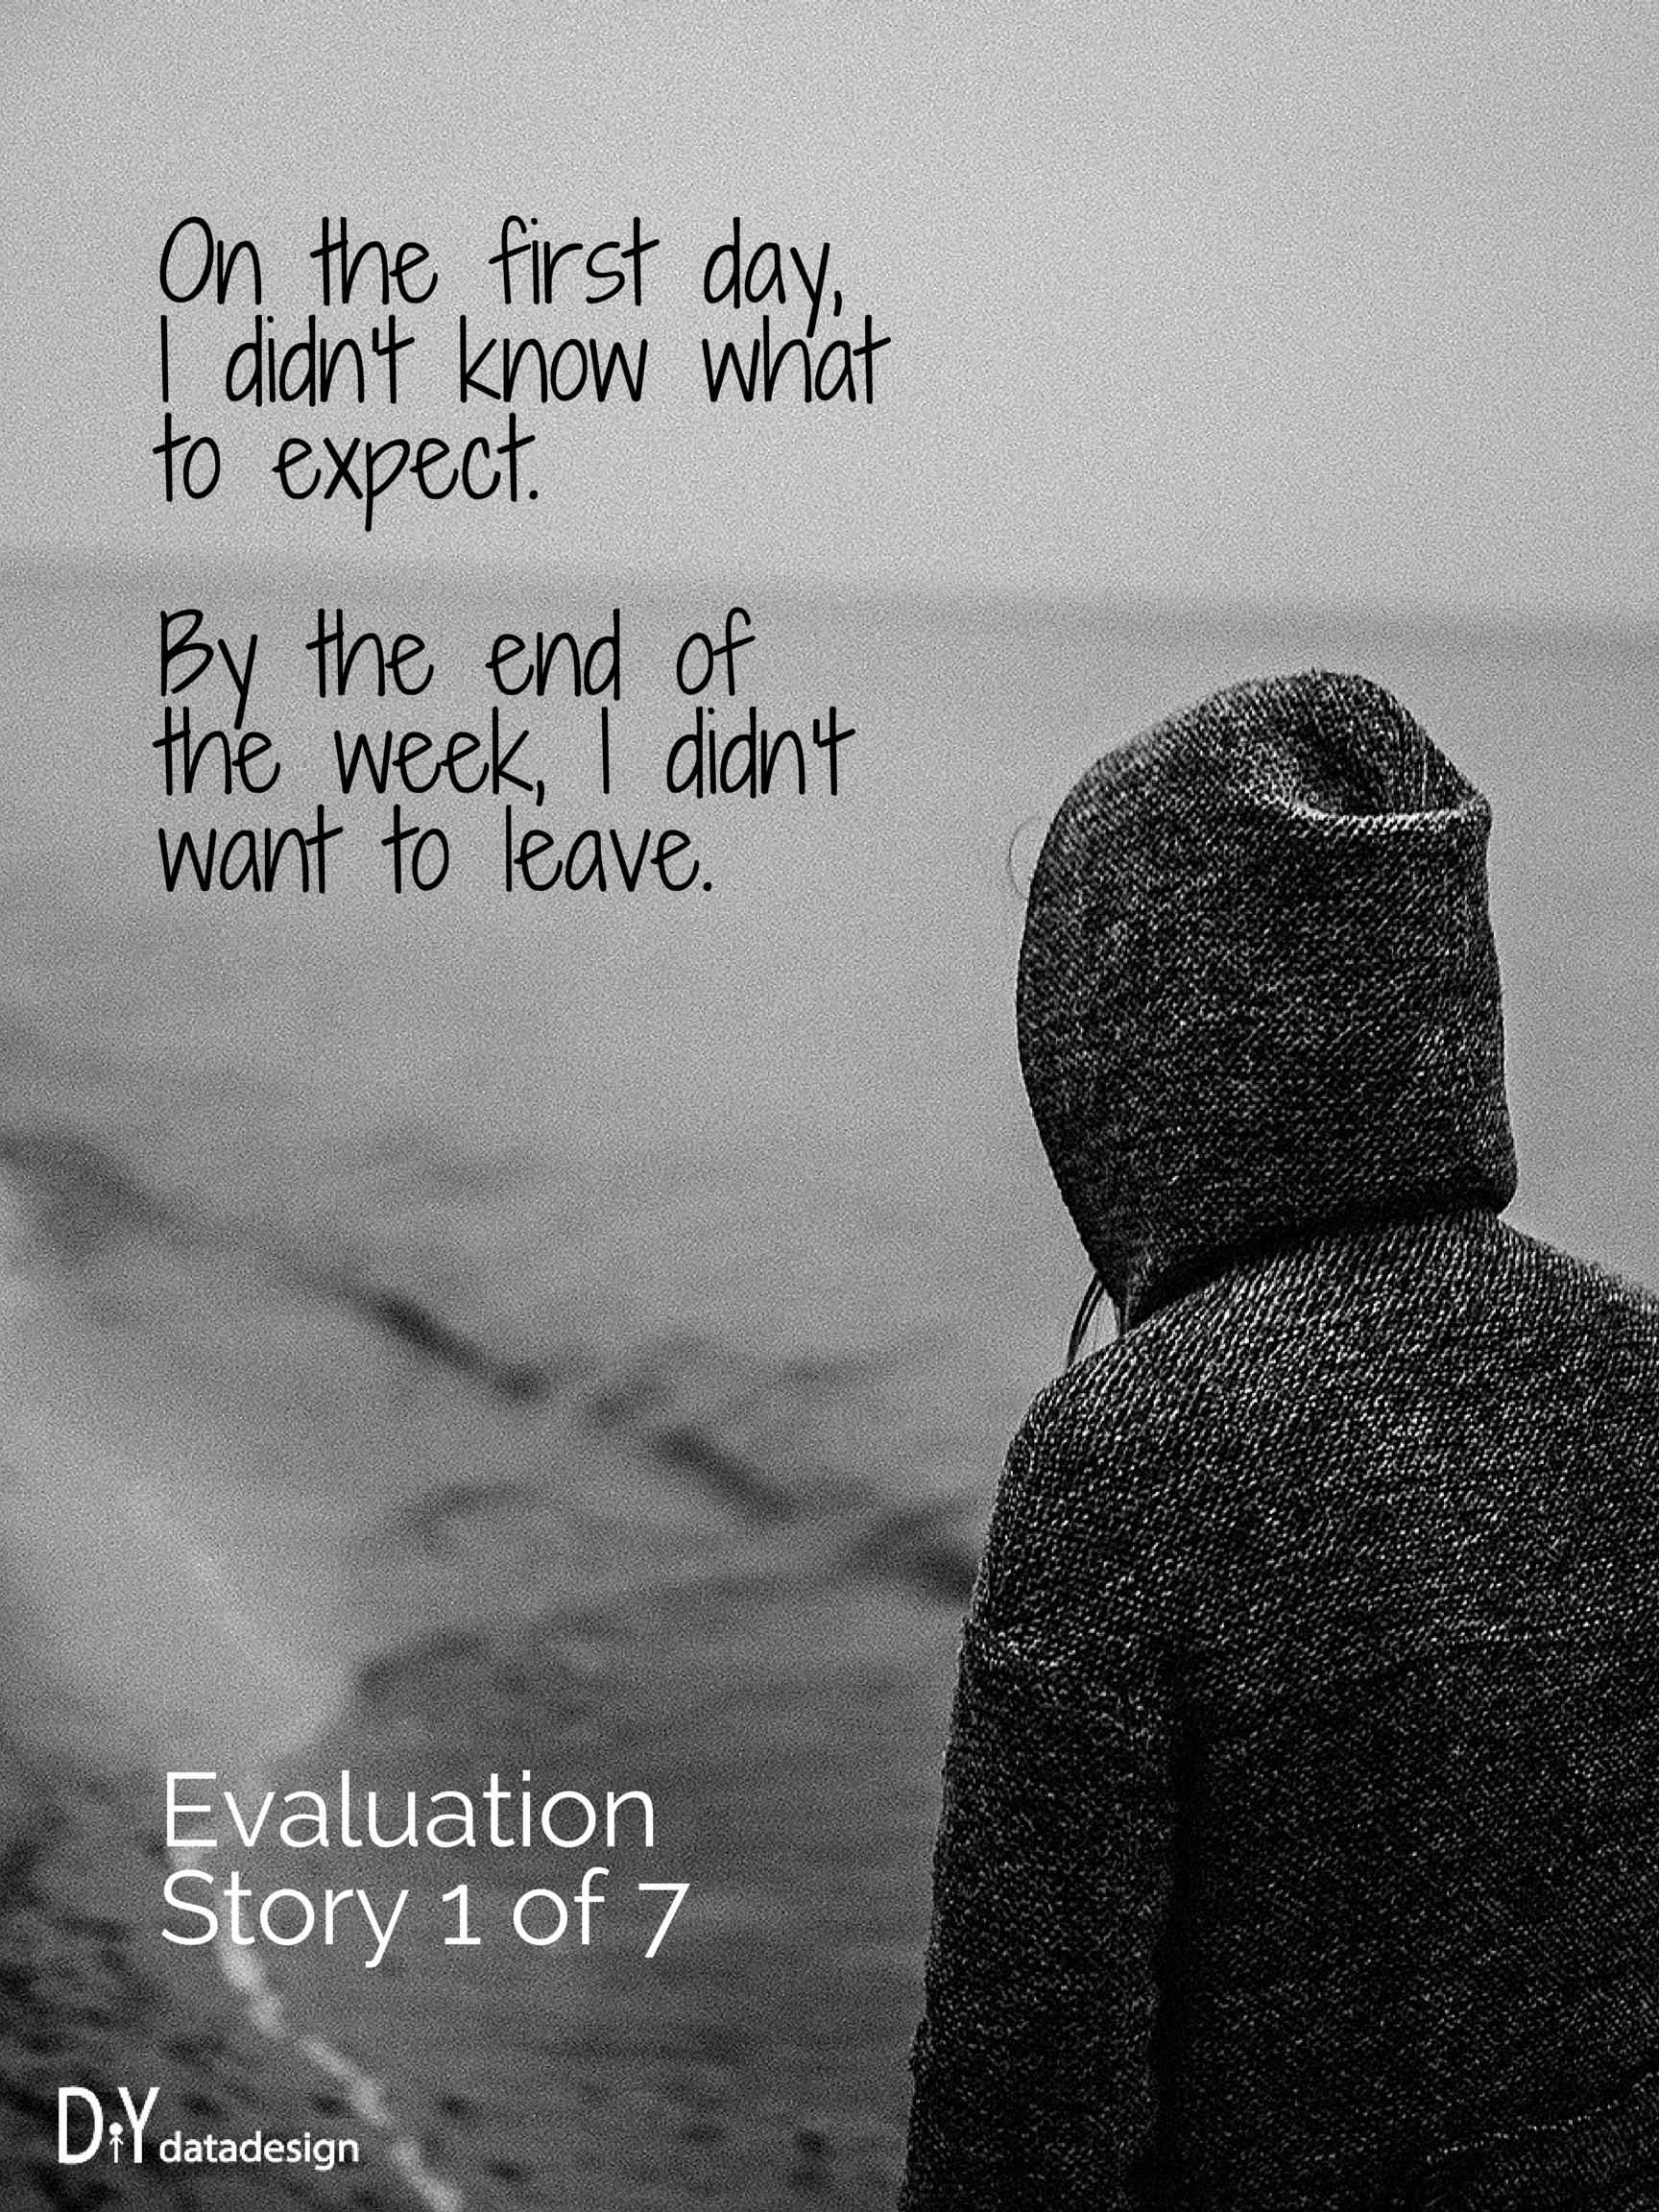 Qualitative poster design - Creative Challenge Qualitative Story Poster Design Diydatadesign